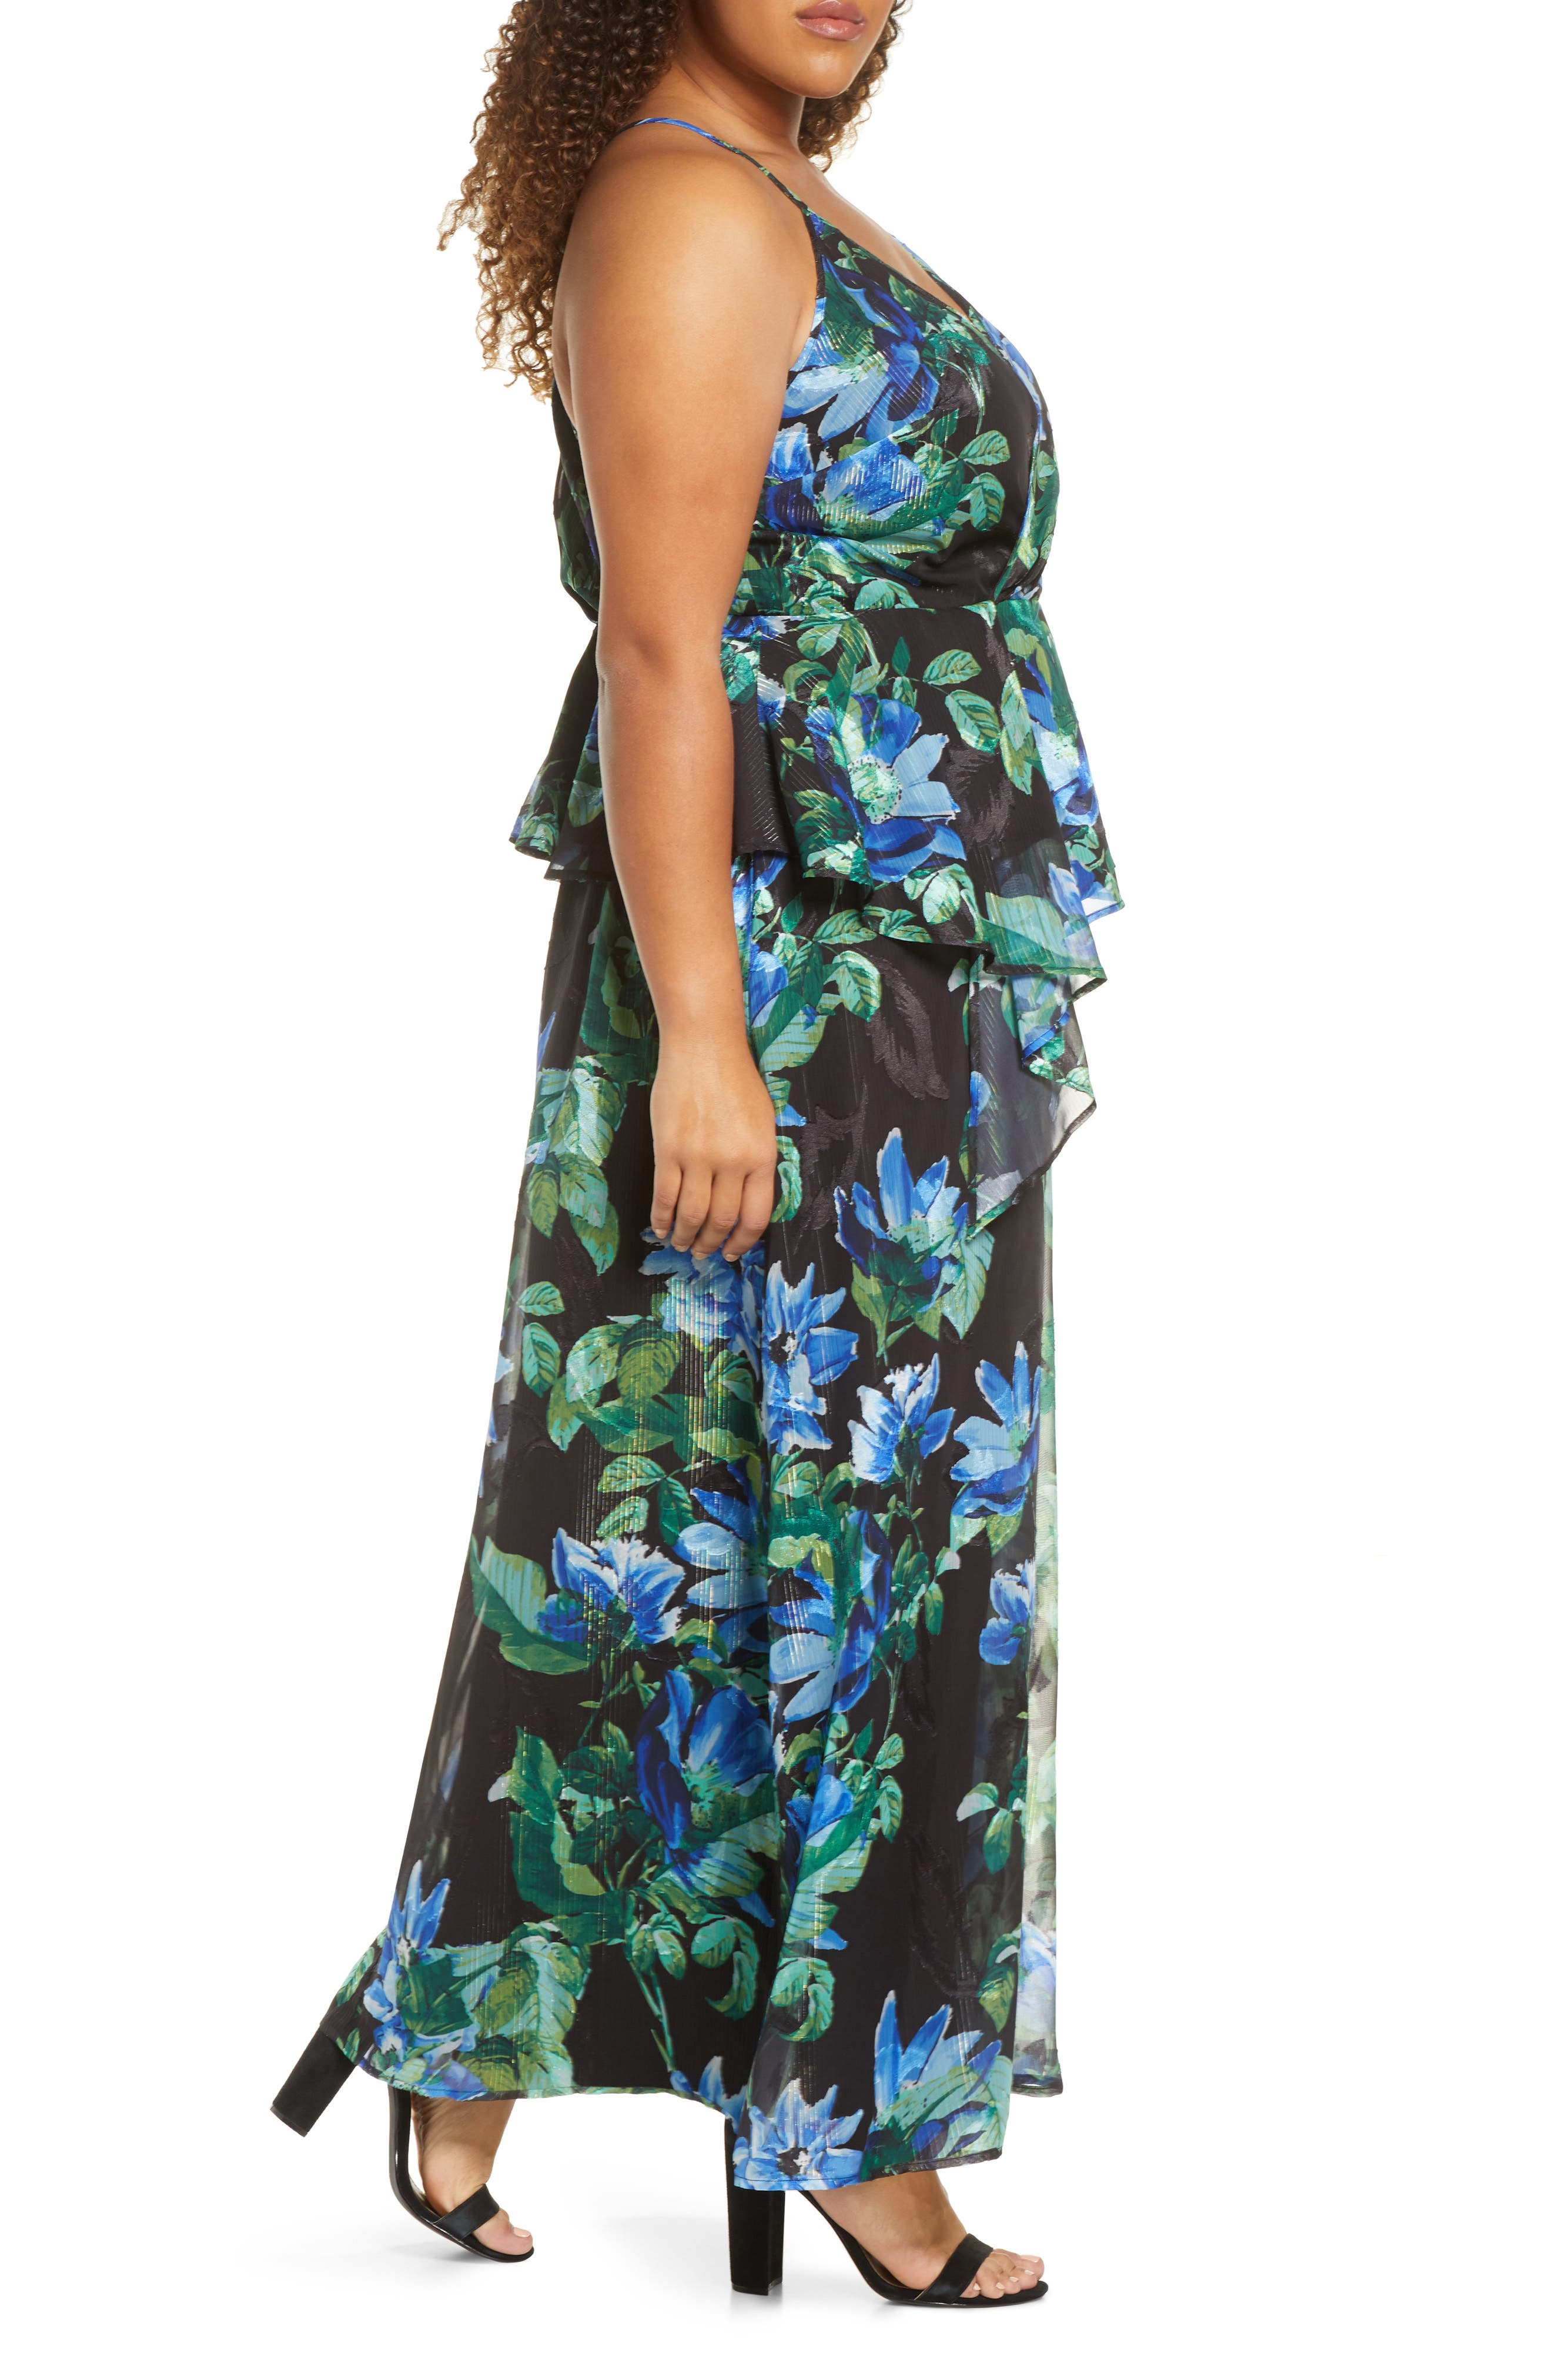 Maree Pour Toi Floral Asymmetrical Maxi Dress